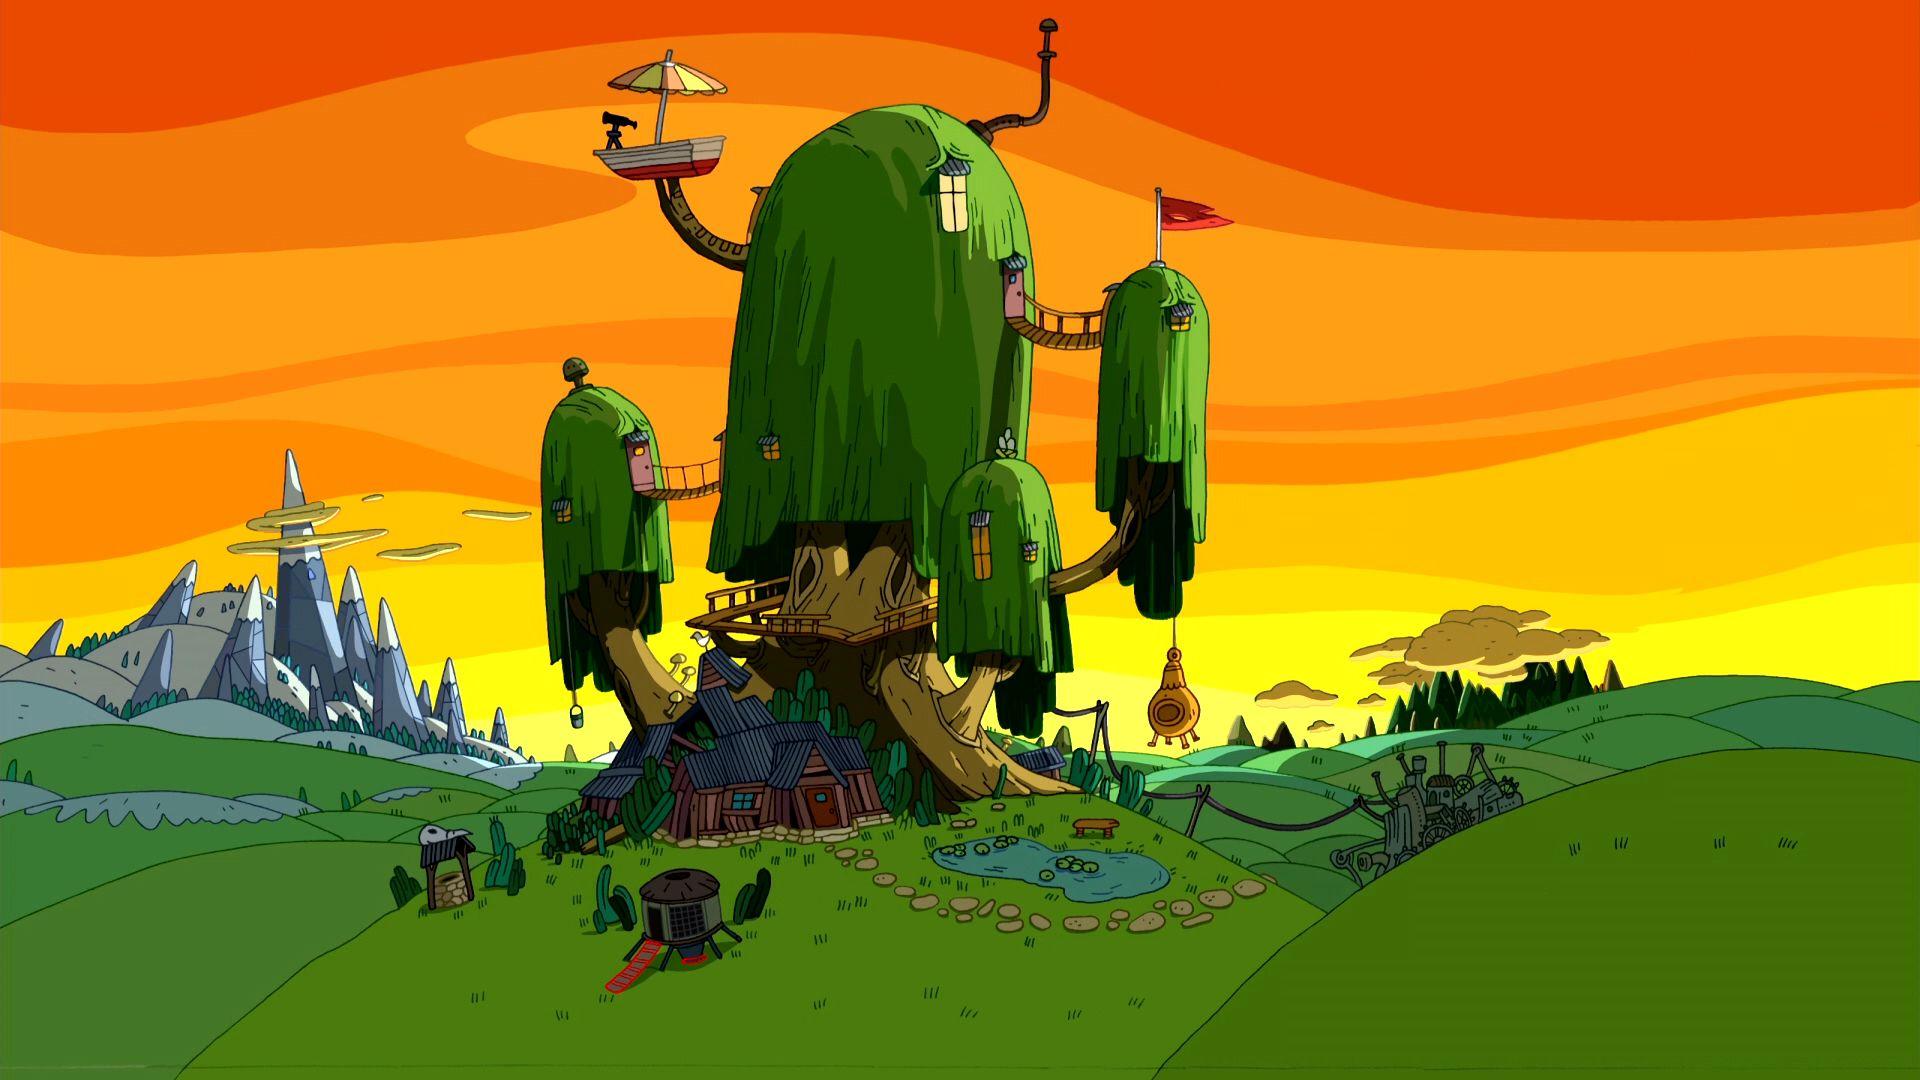 S01e06 Sunset Treehouse Adventure Time Wallpaper Adventure Time Background Adventure Time Scenery